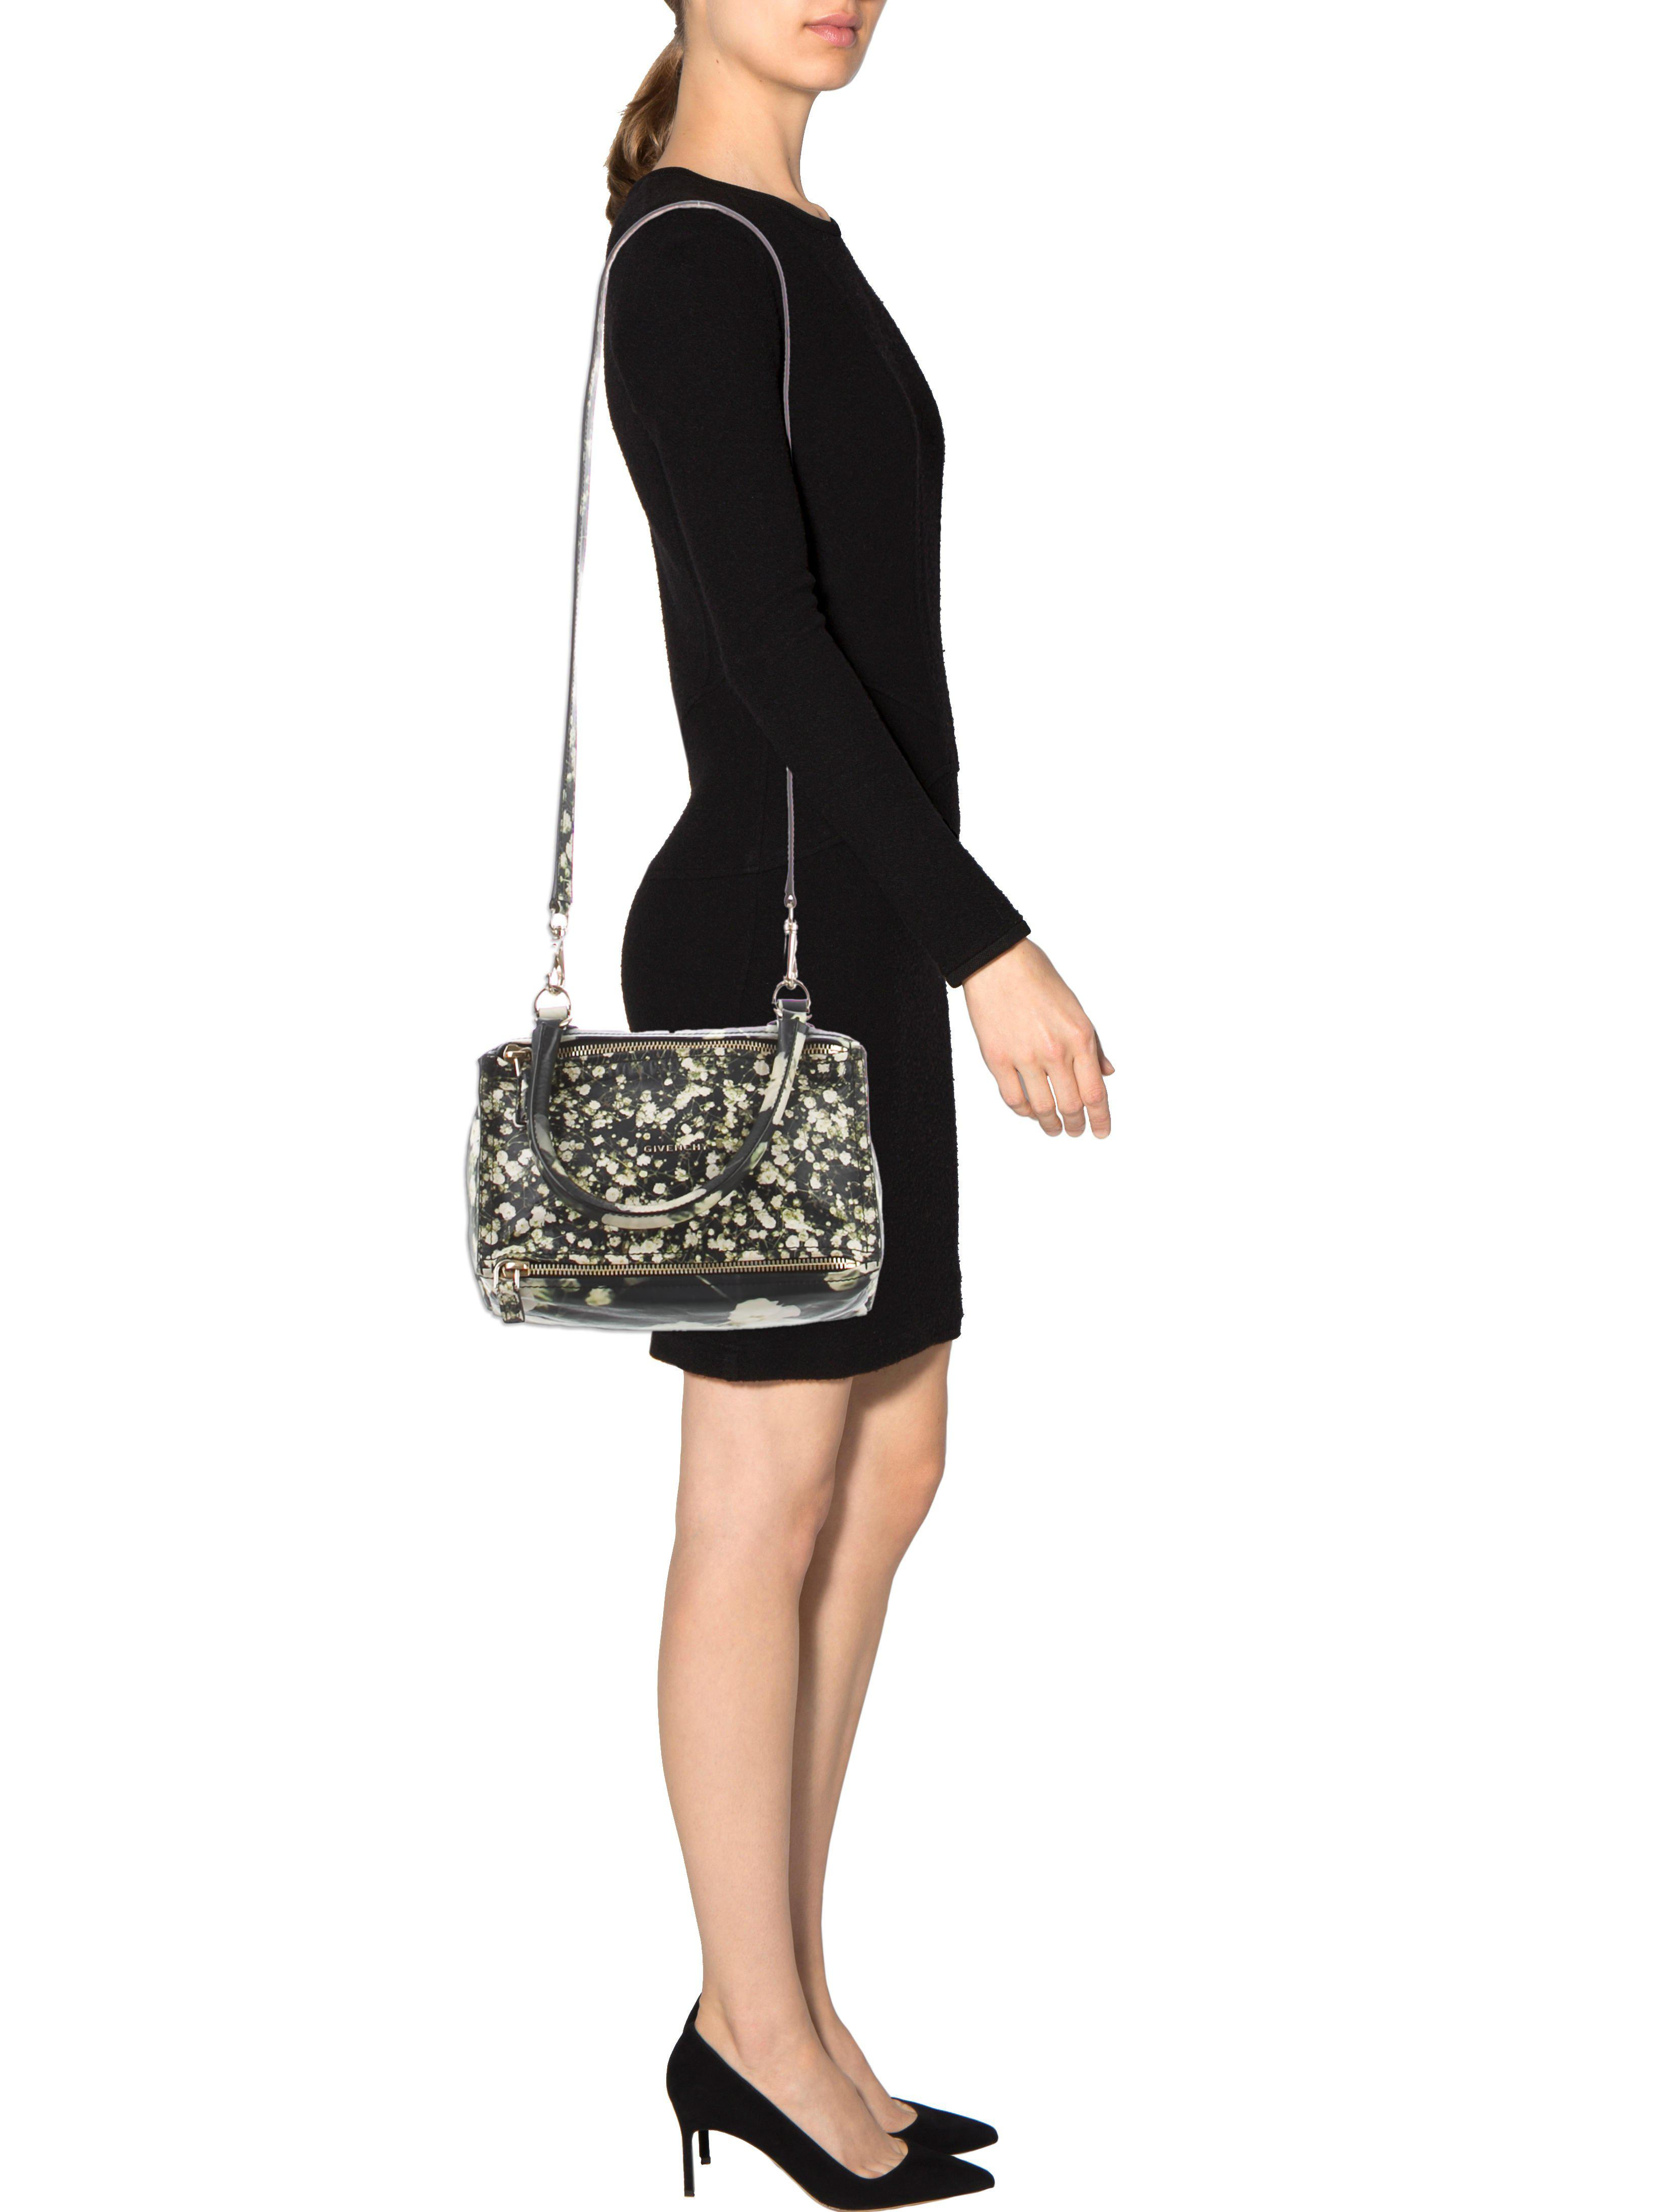 646baf81d5 Givenchy - Metallic Small Pandora Bag Black - Lyst. View fullscreen